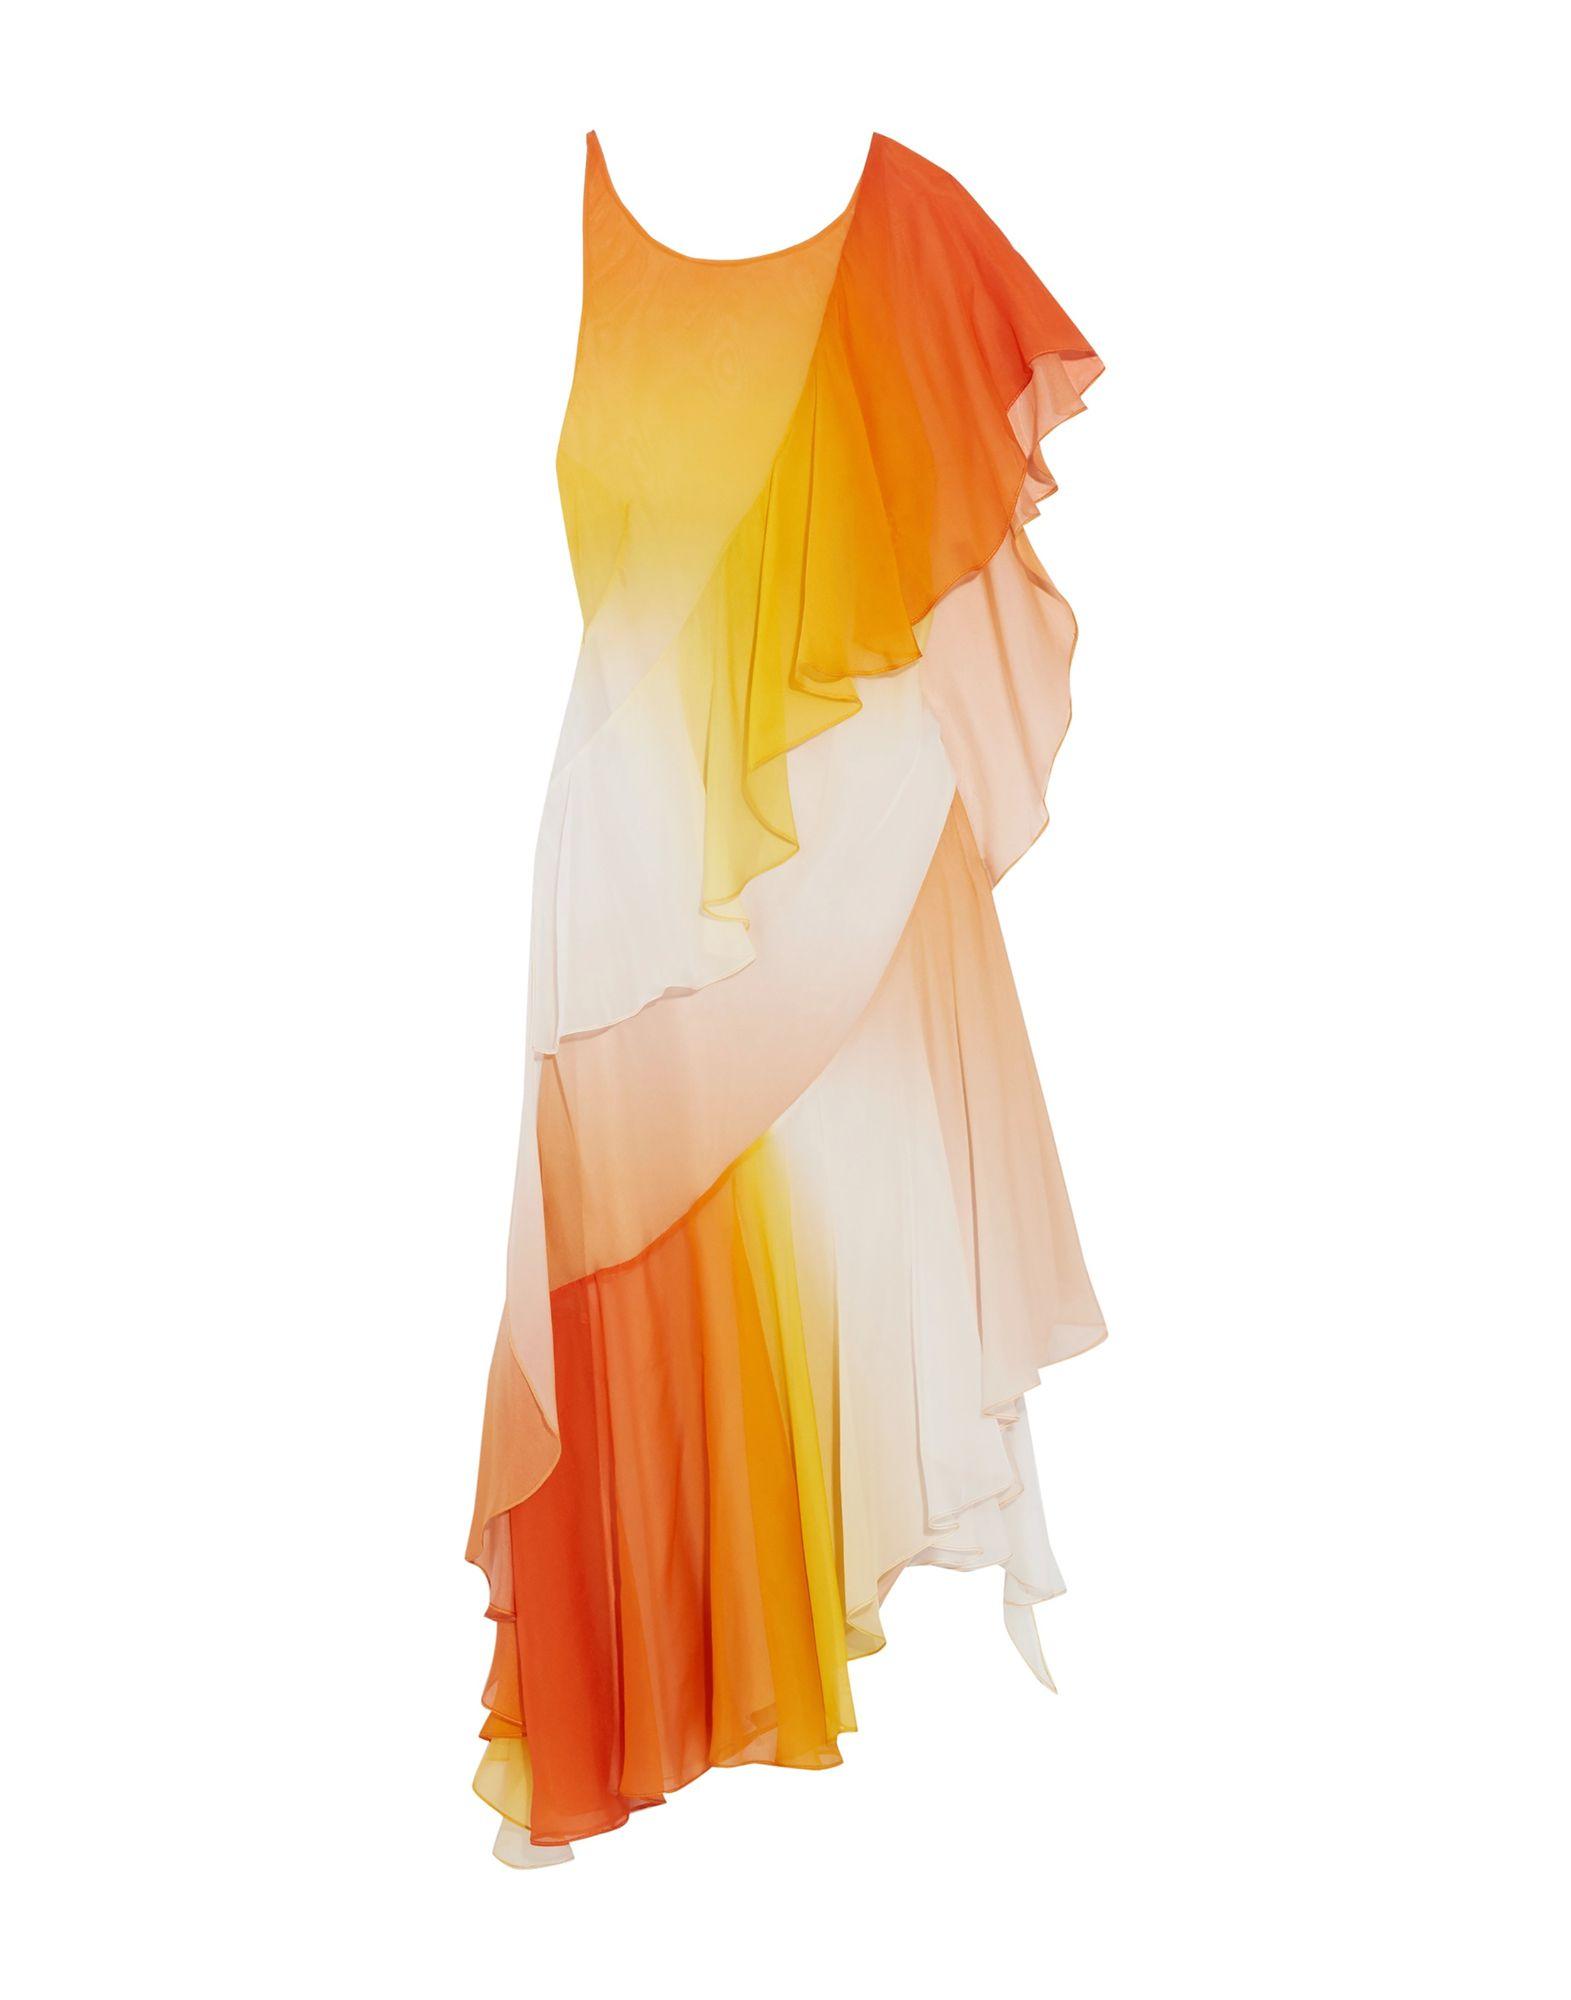 TEMPERLEY LONDON Короткое платье платье alice by temperley платья и сарафаны макси длинные